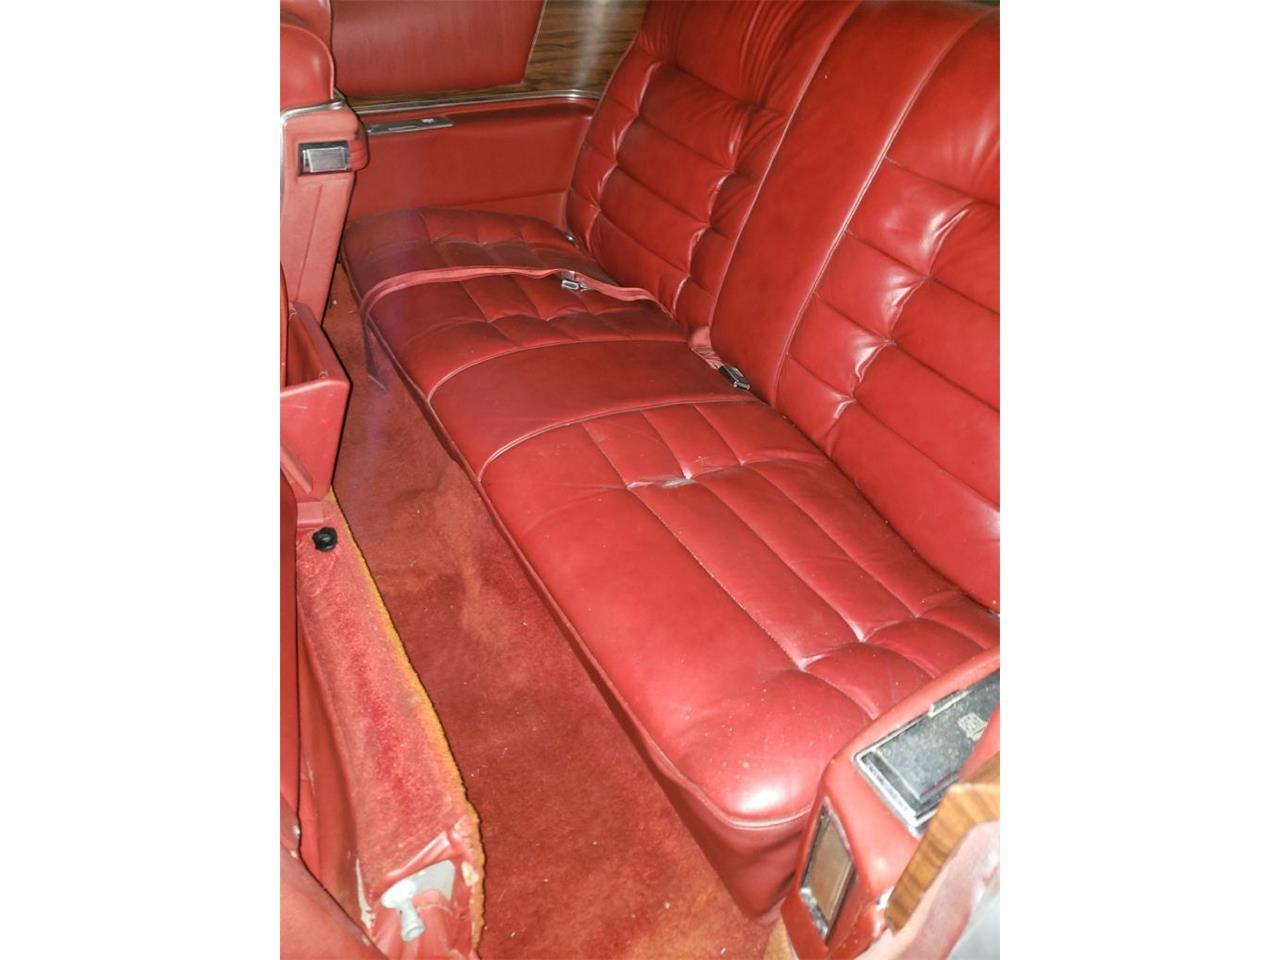 1976 Cadillac Eldorado (CC-1350461) for sale in West Pittston, Pennsylvania